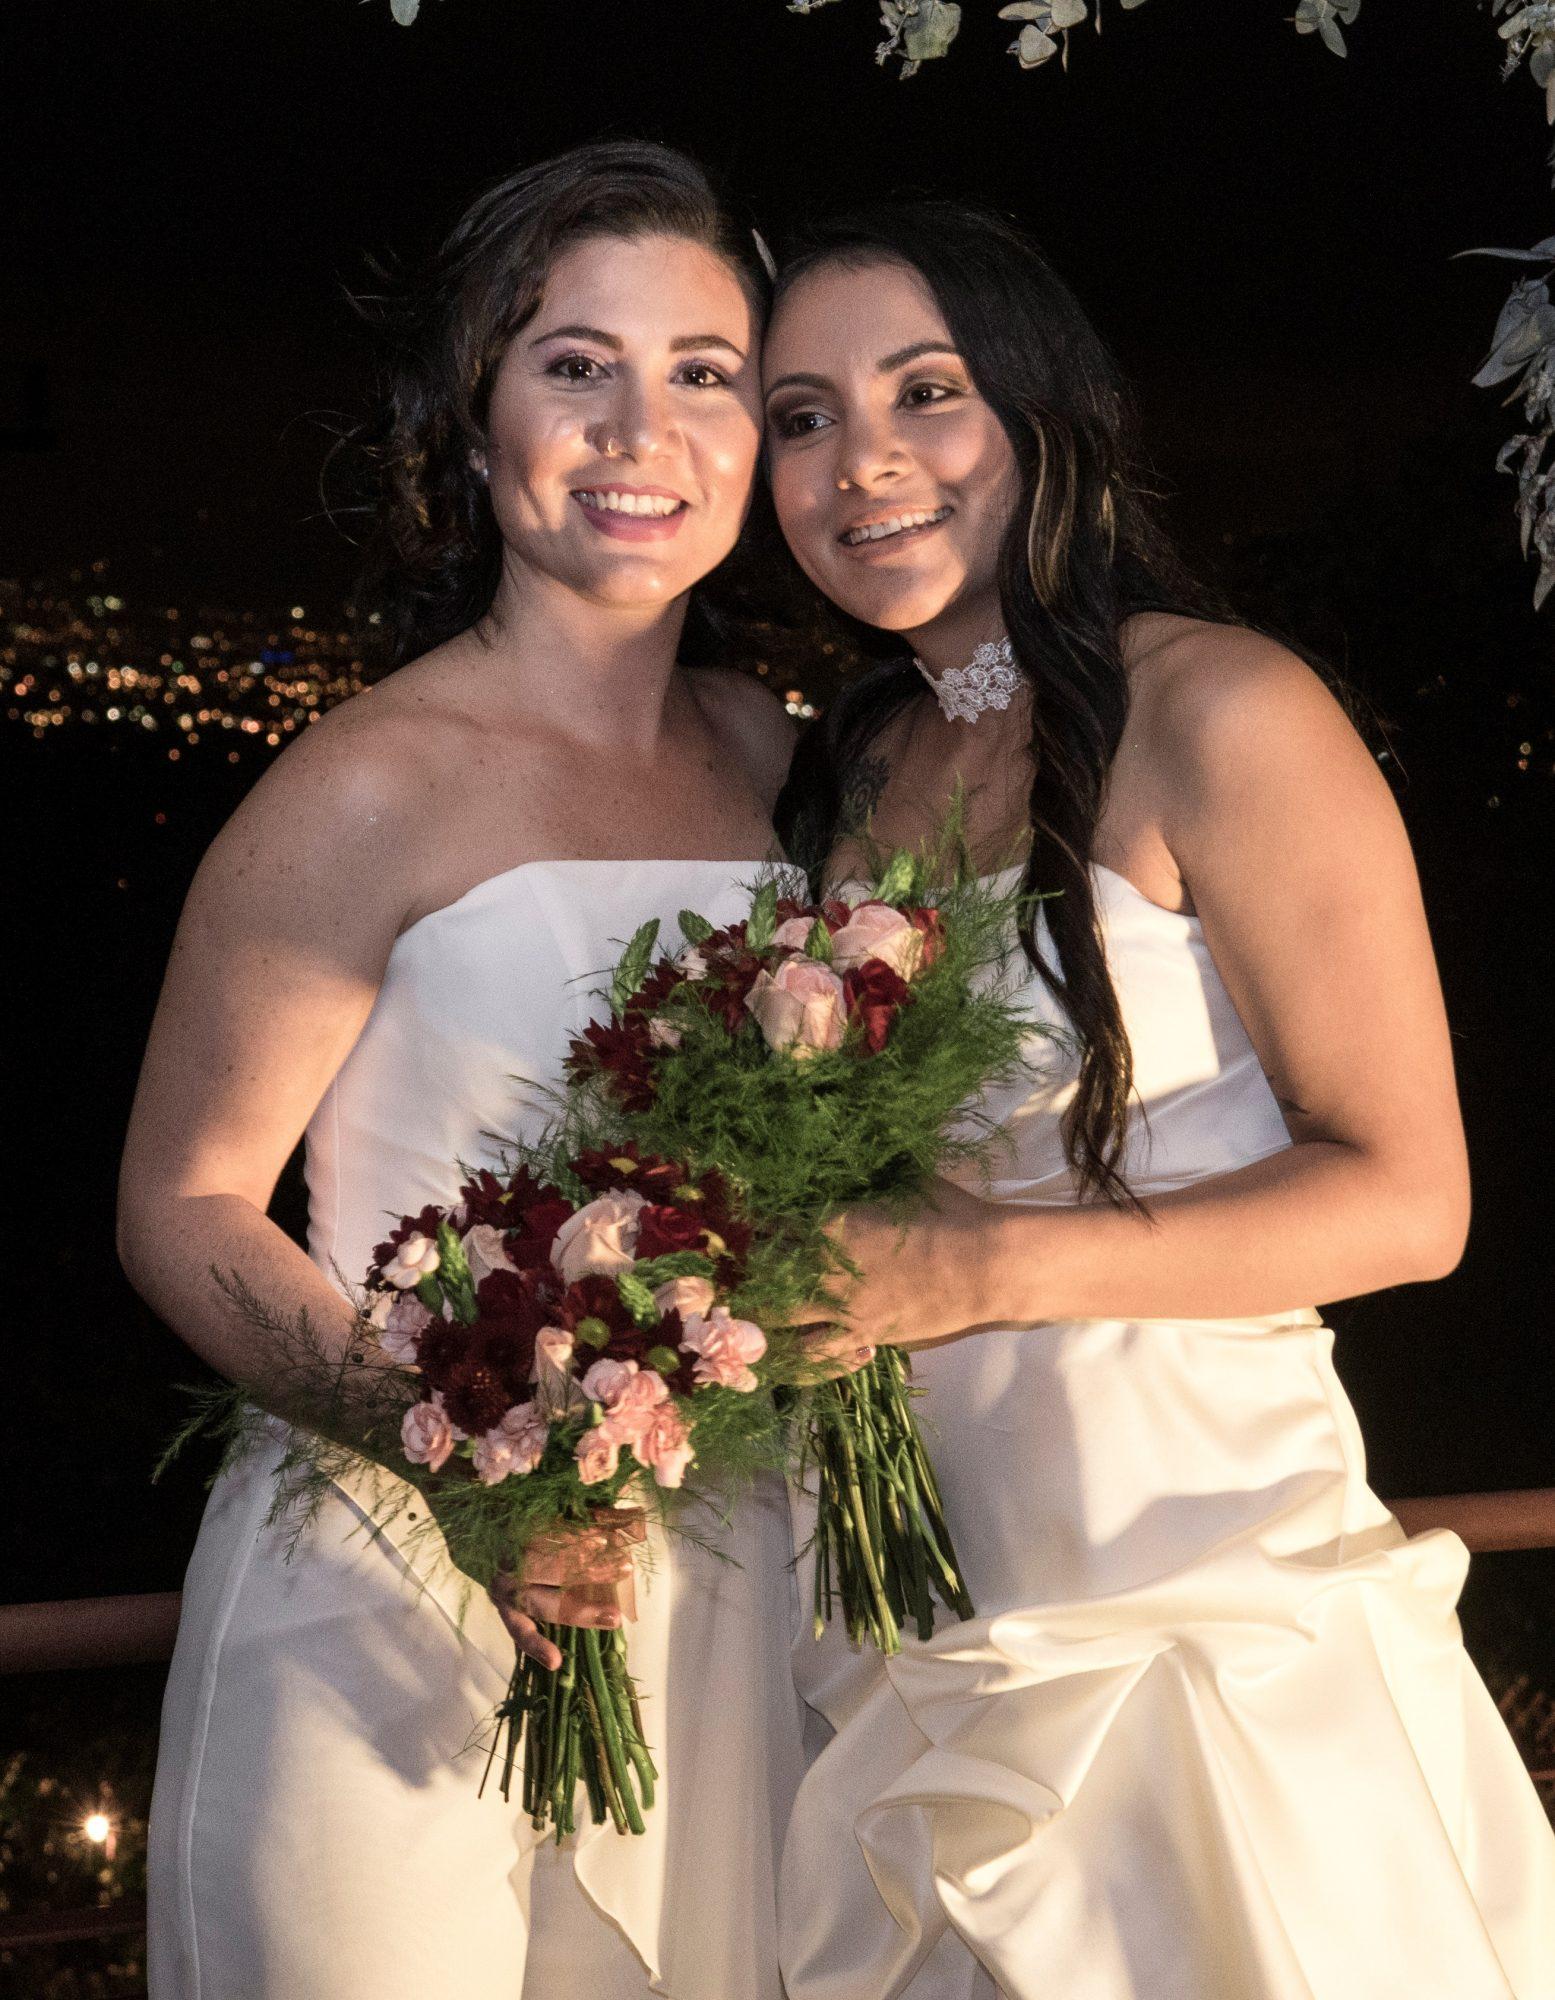 Costa Rica same-sex marriage